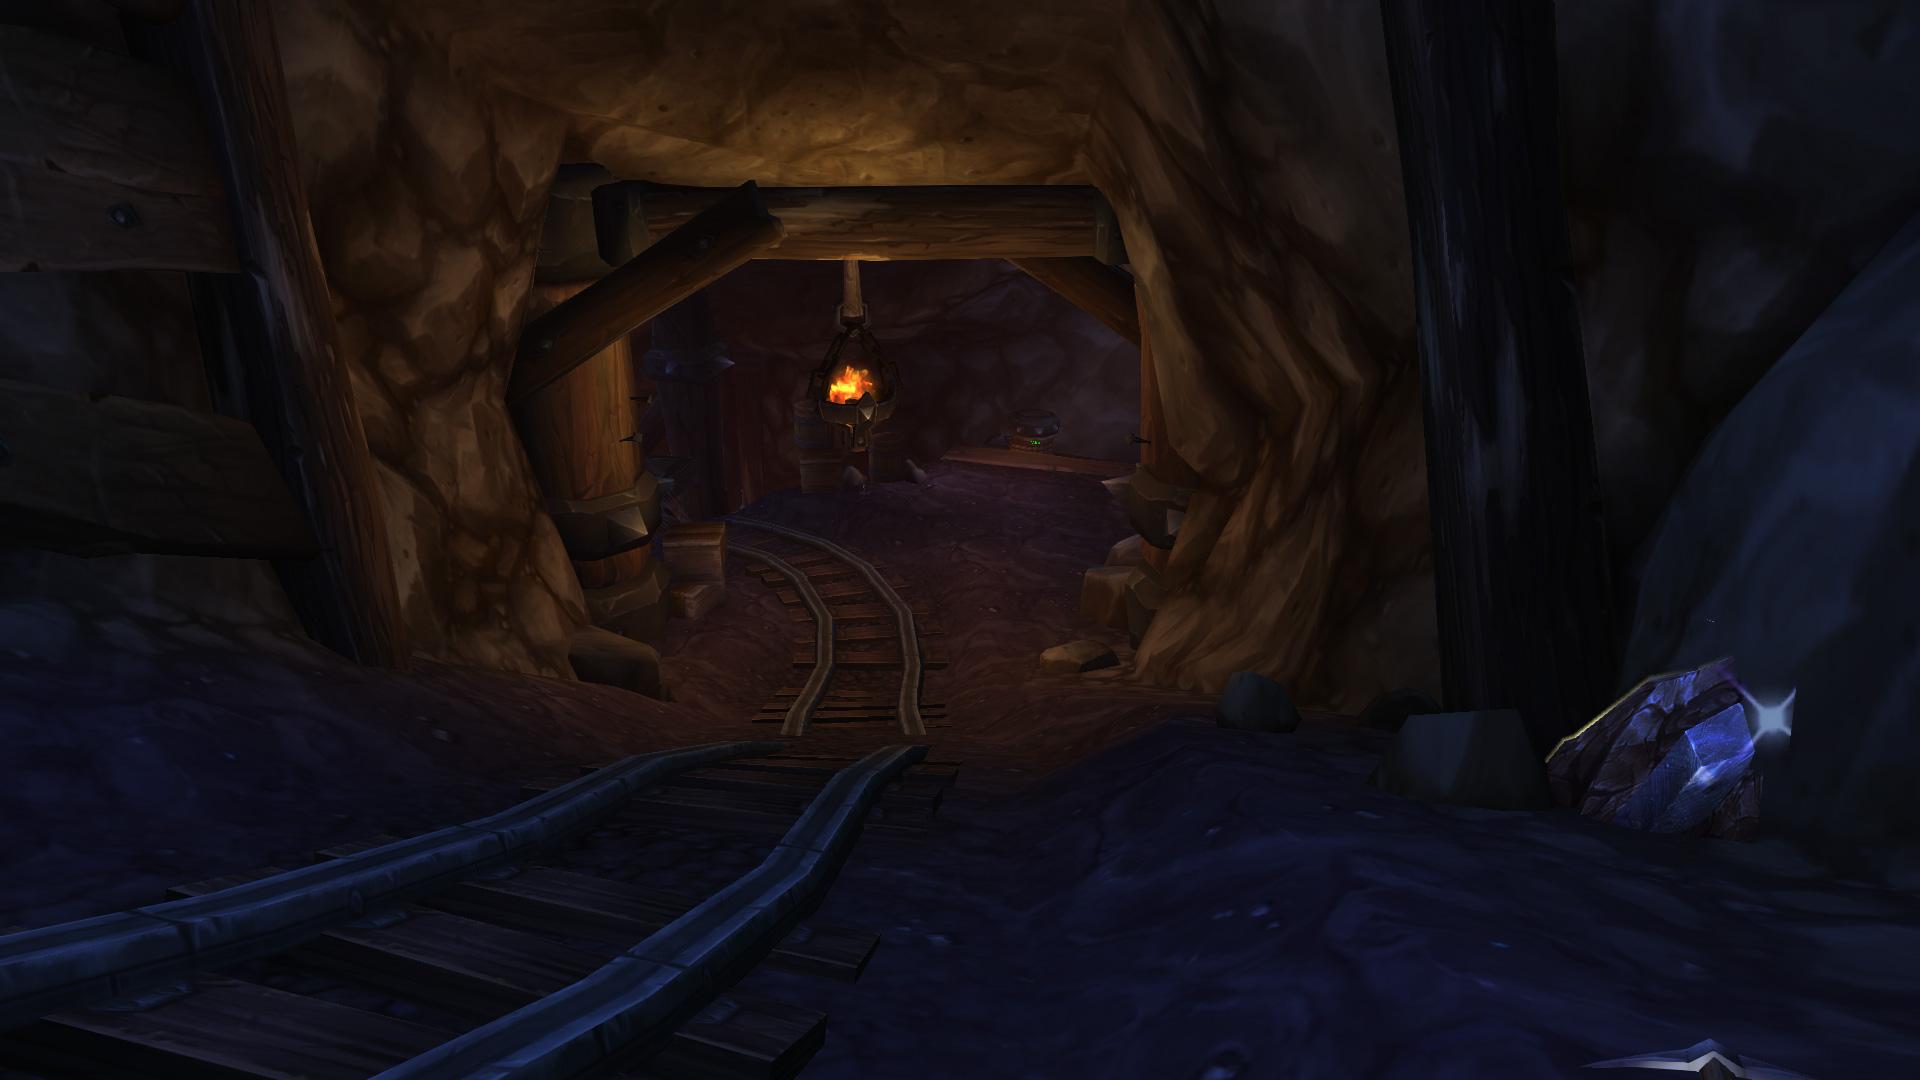 Warlords of draenor garrisons lunarfall excavation frostwall level 2 screenshots level 3 screenshots malvernweather Choice Image